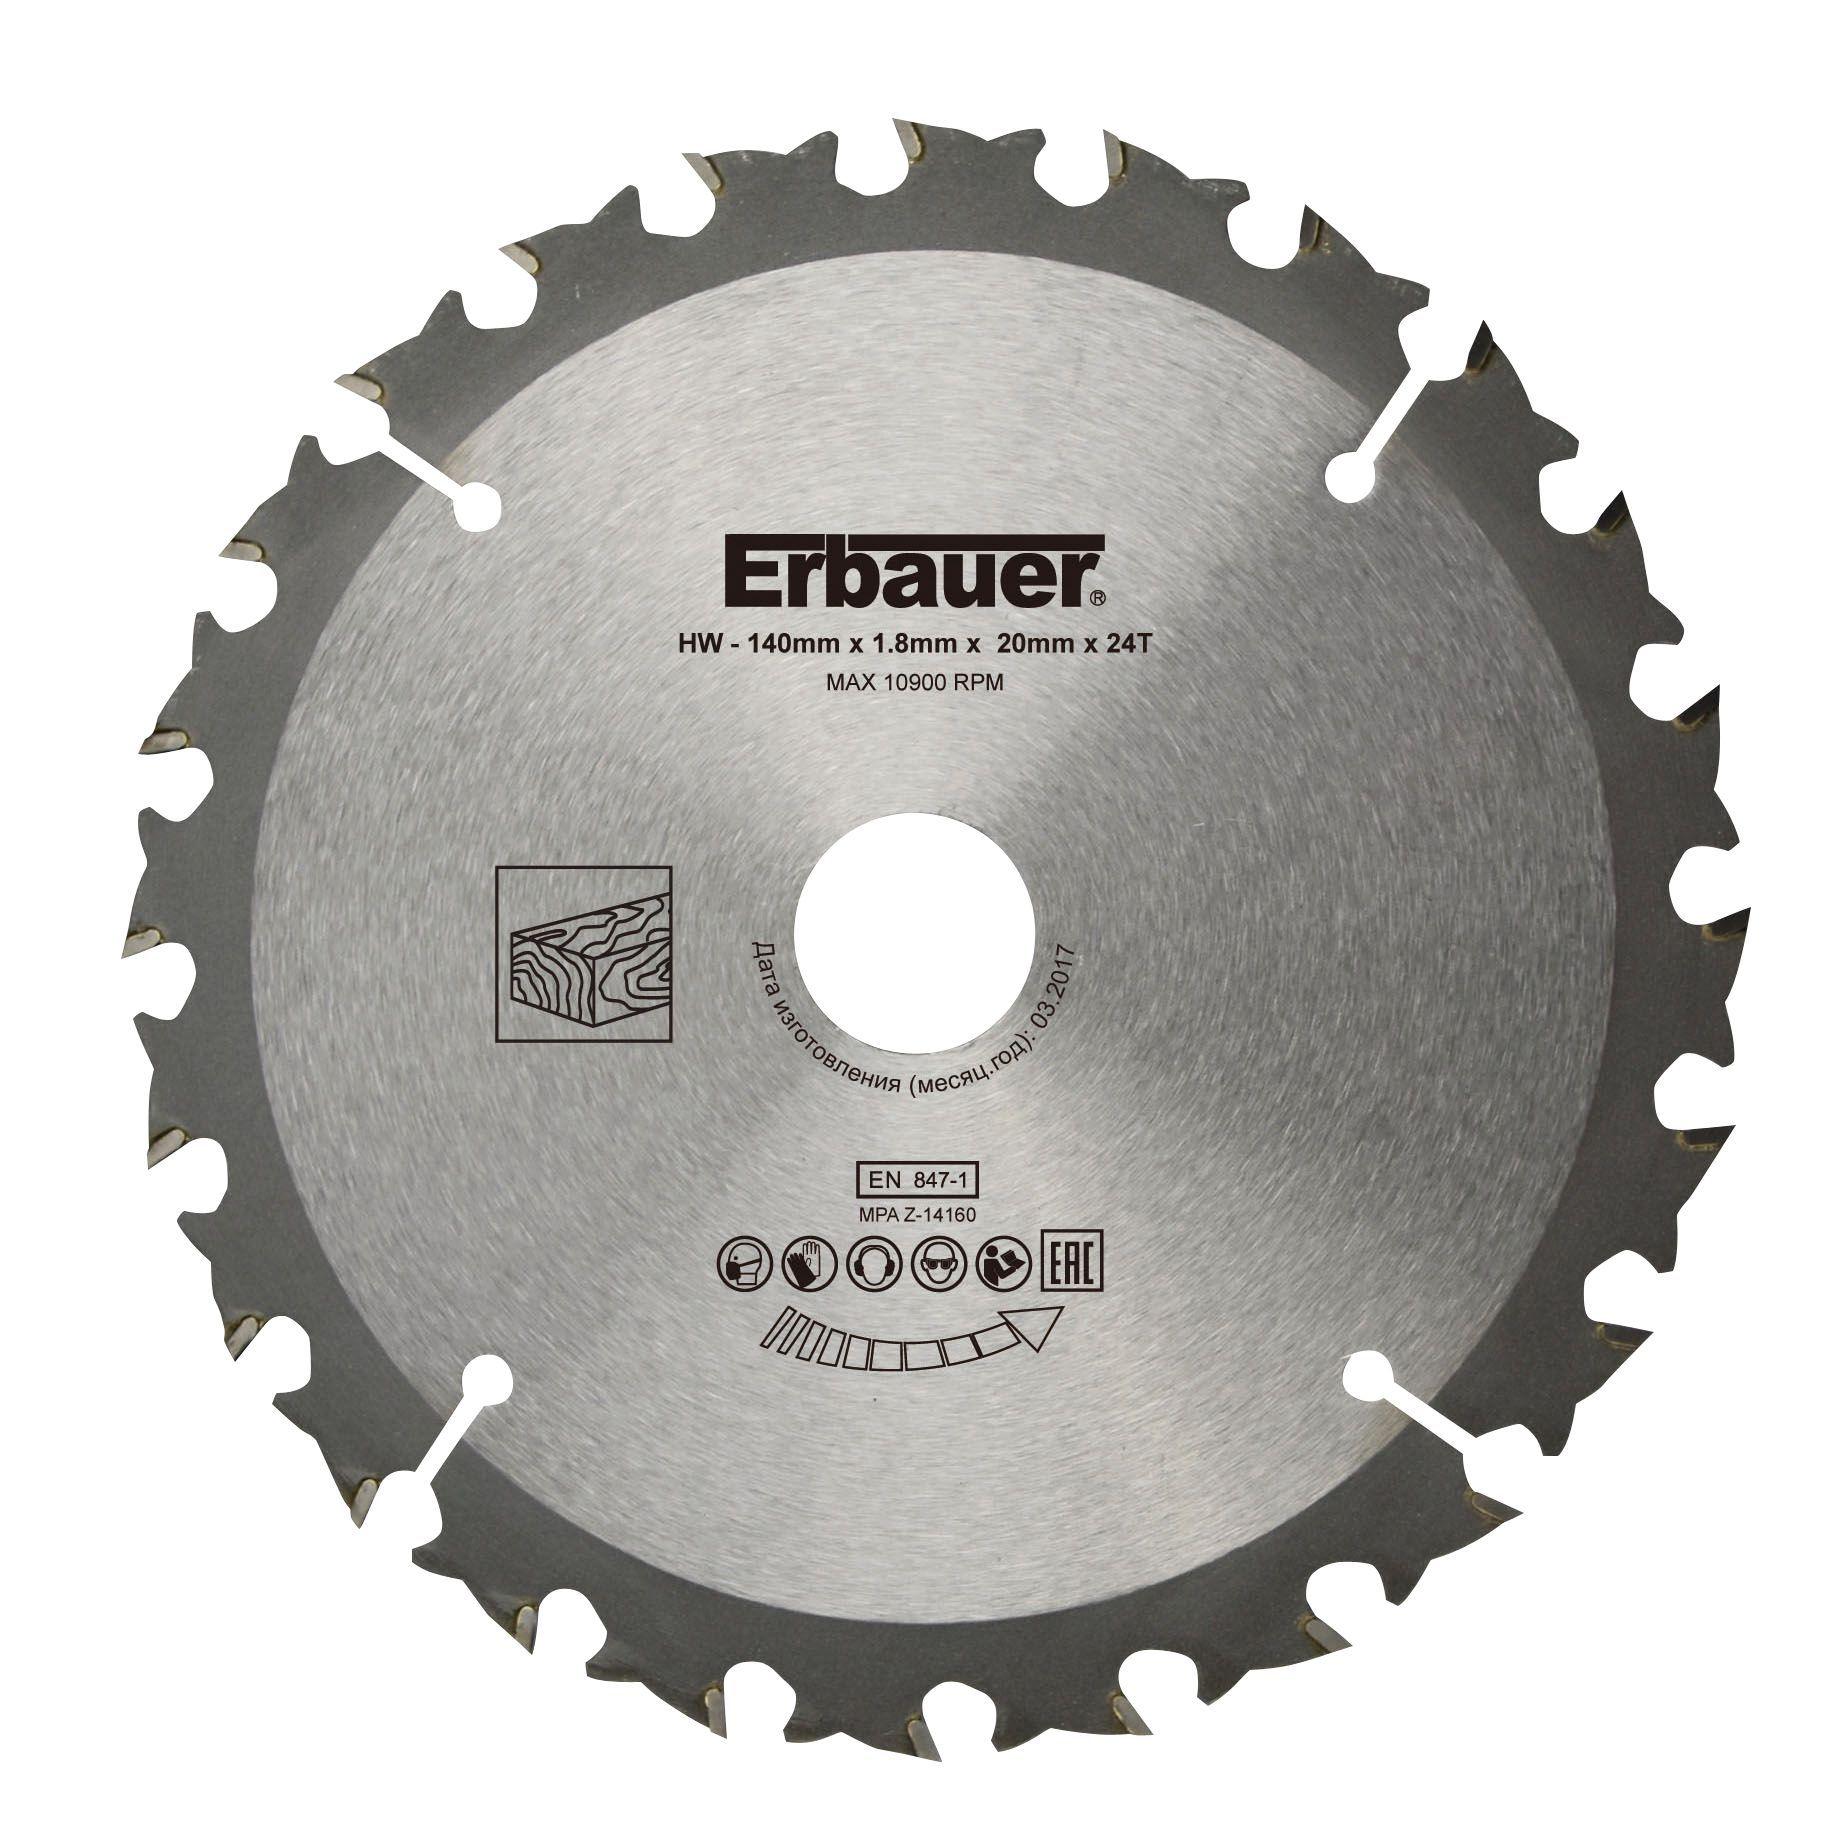 Erbauer circular saw blade dia140mm departments diy at bq greentooth Images